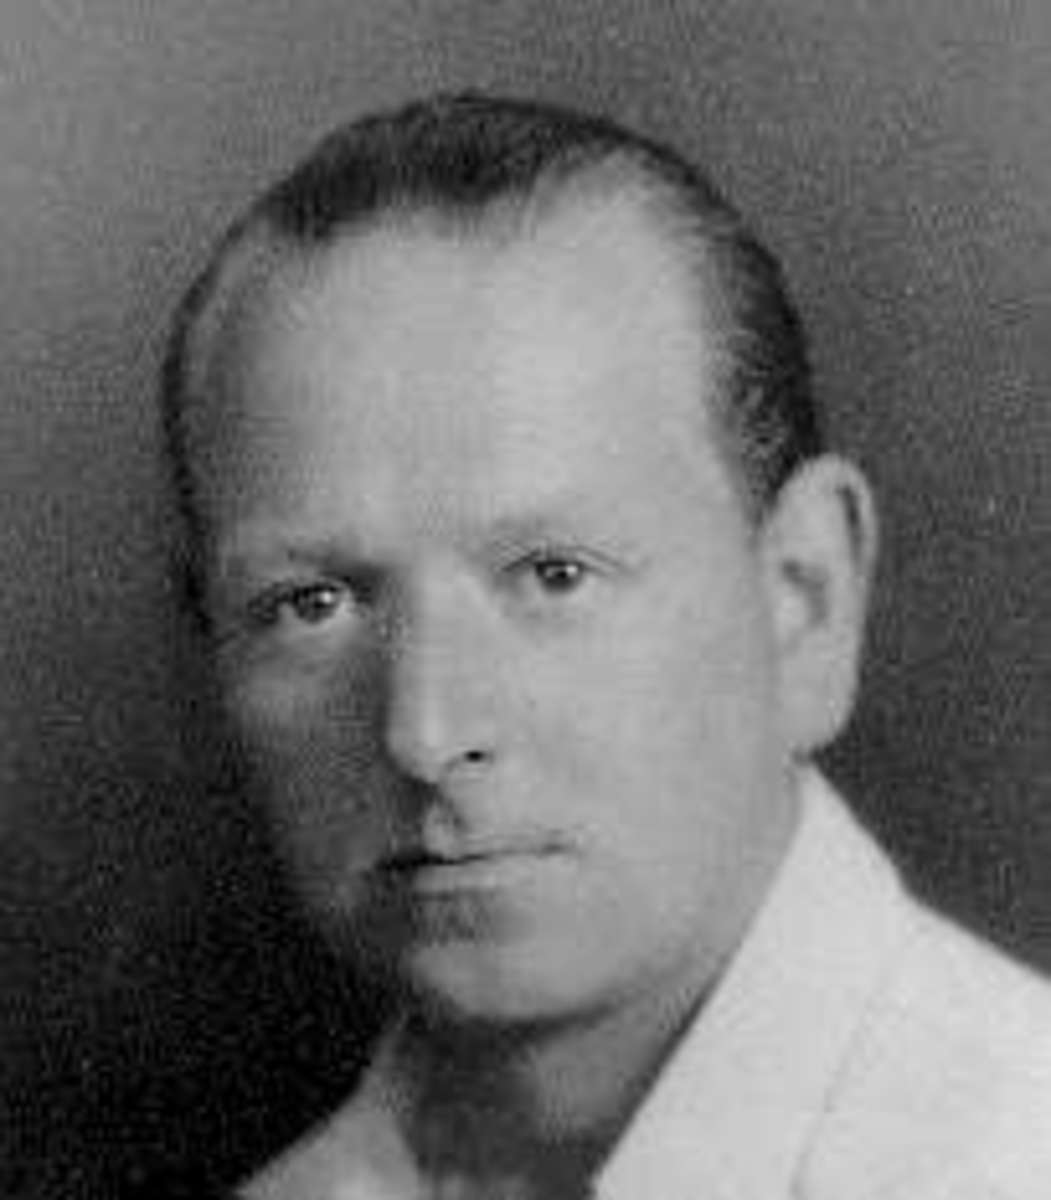 Dr. Edward Bach, developer of Bach Flower Remedies